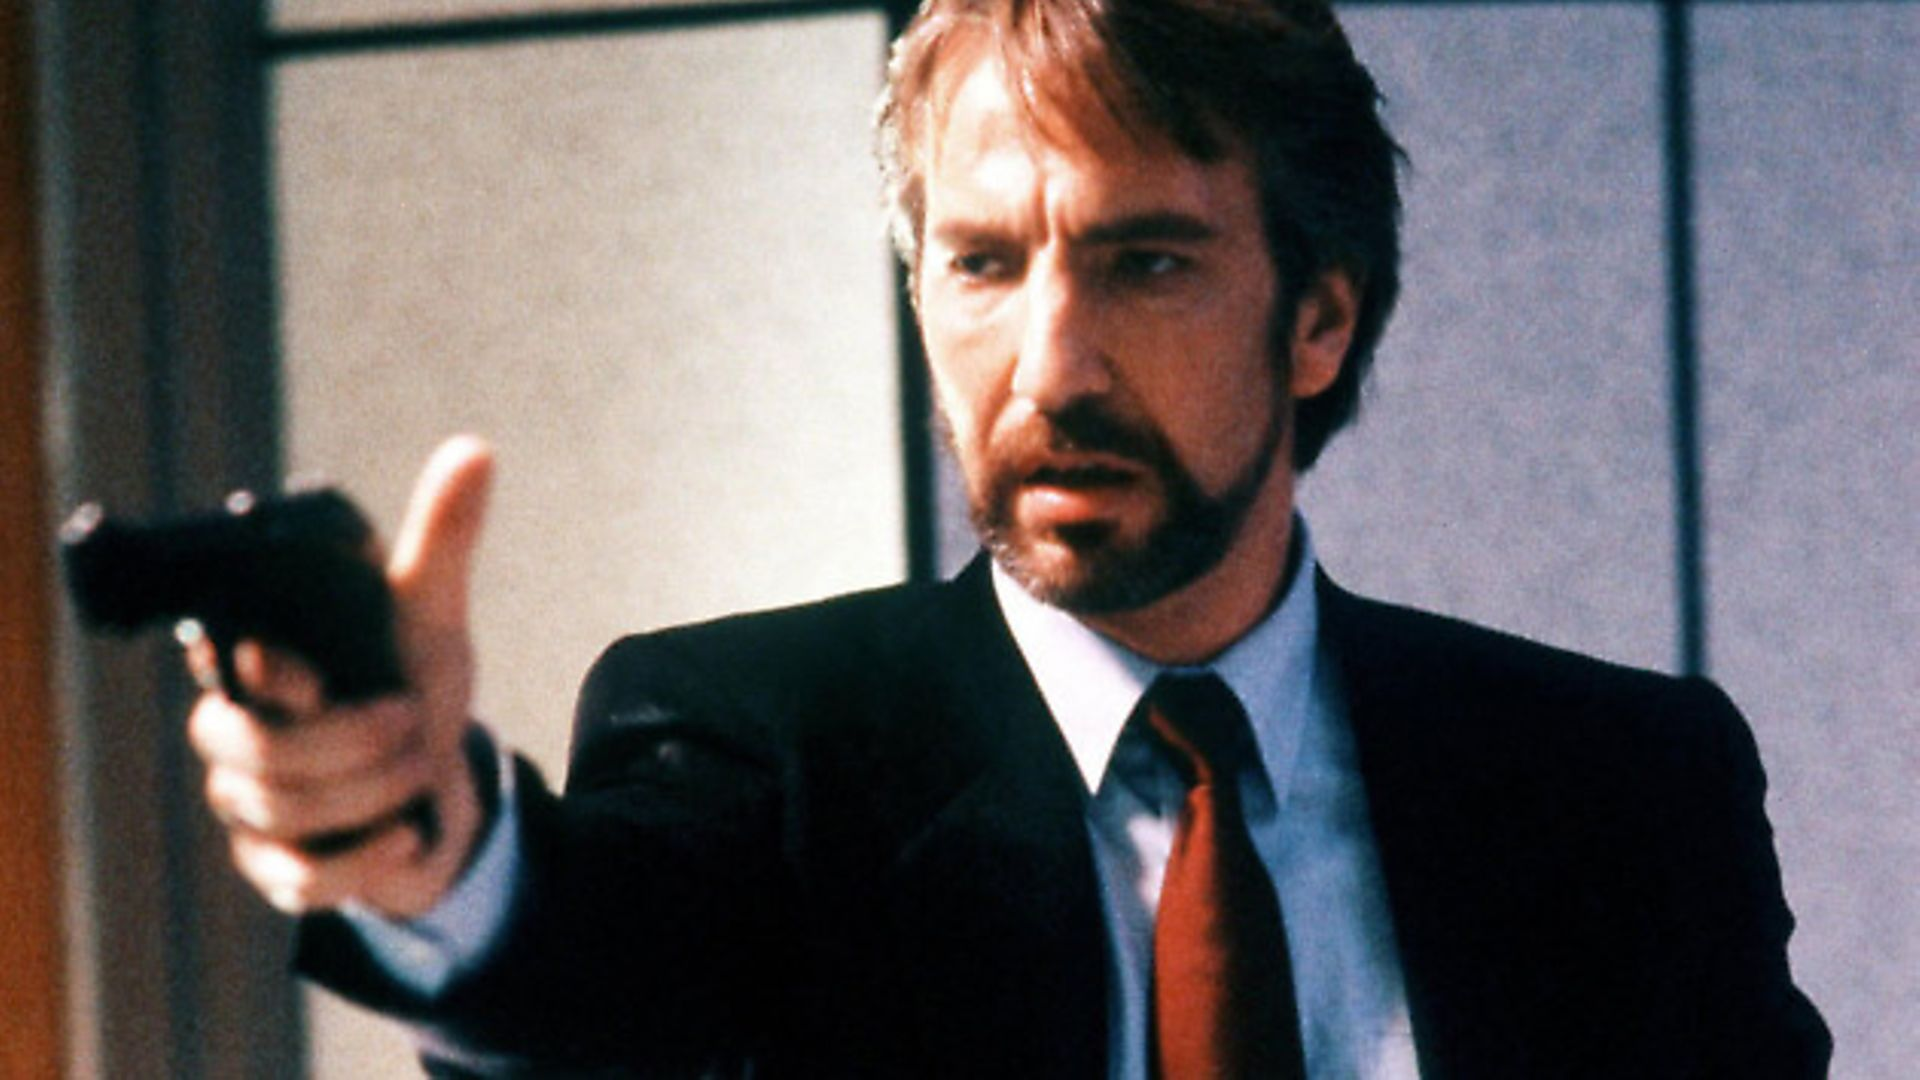 Alan Rickman   in Die Hard (1988) - Credit: WENN.com